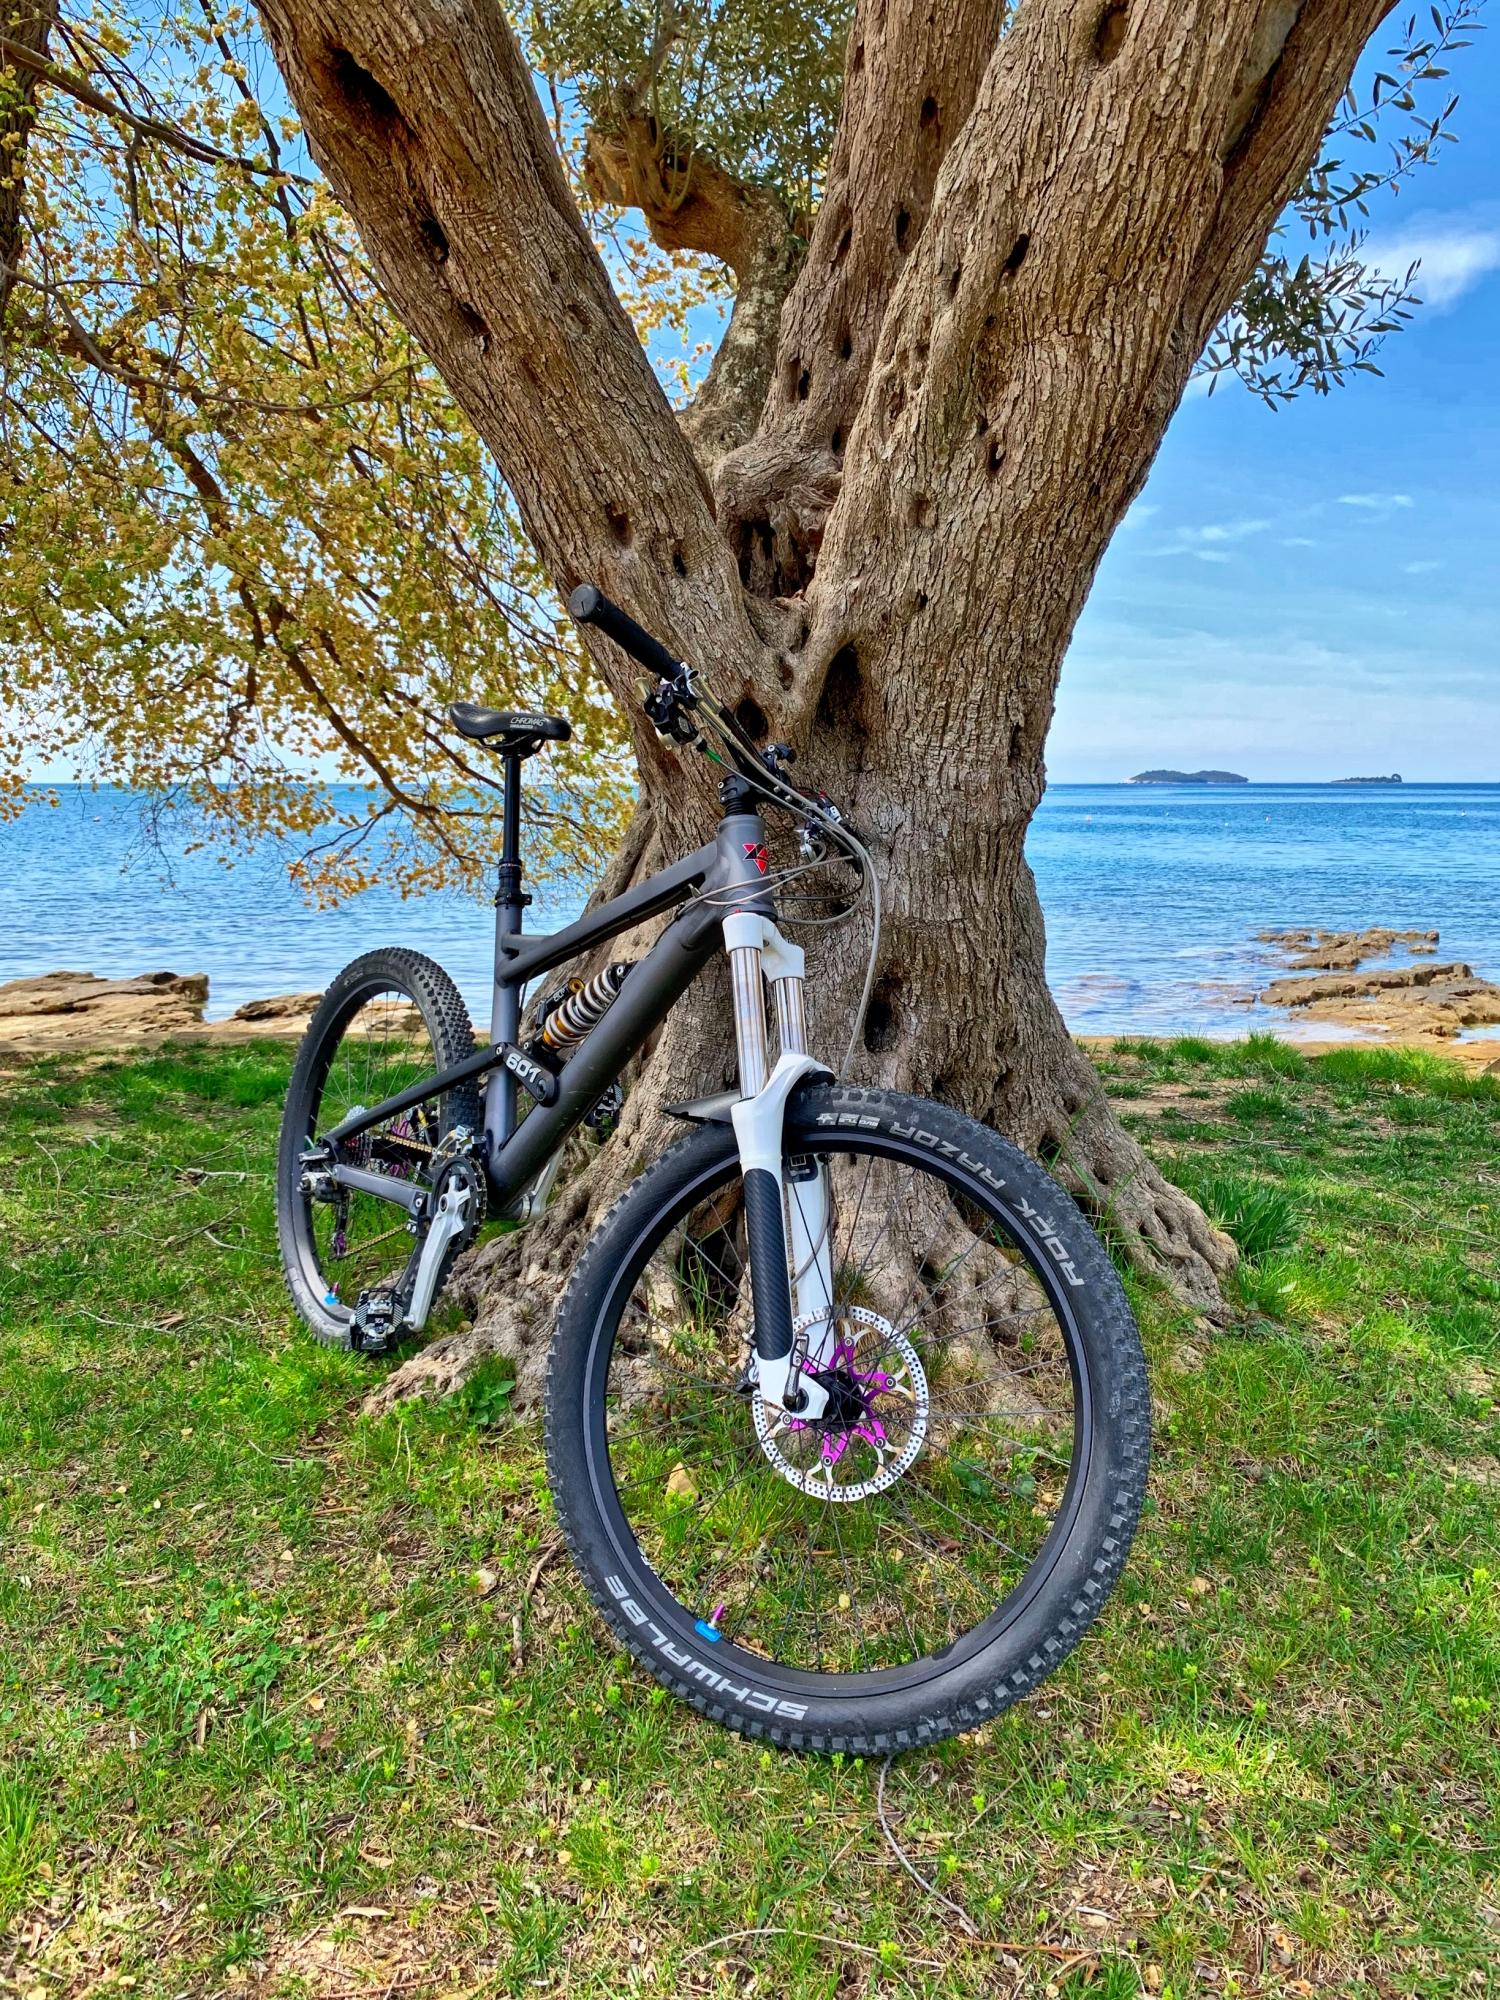 [Obrazek: Rovinj-Bike-04-2019-6.jpg]